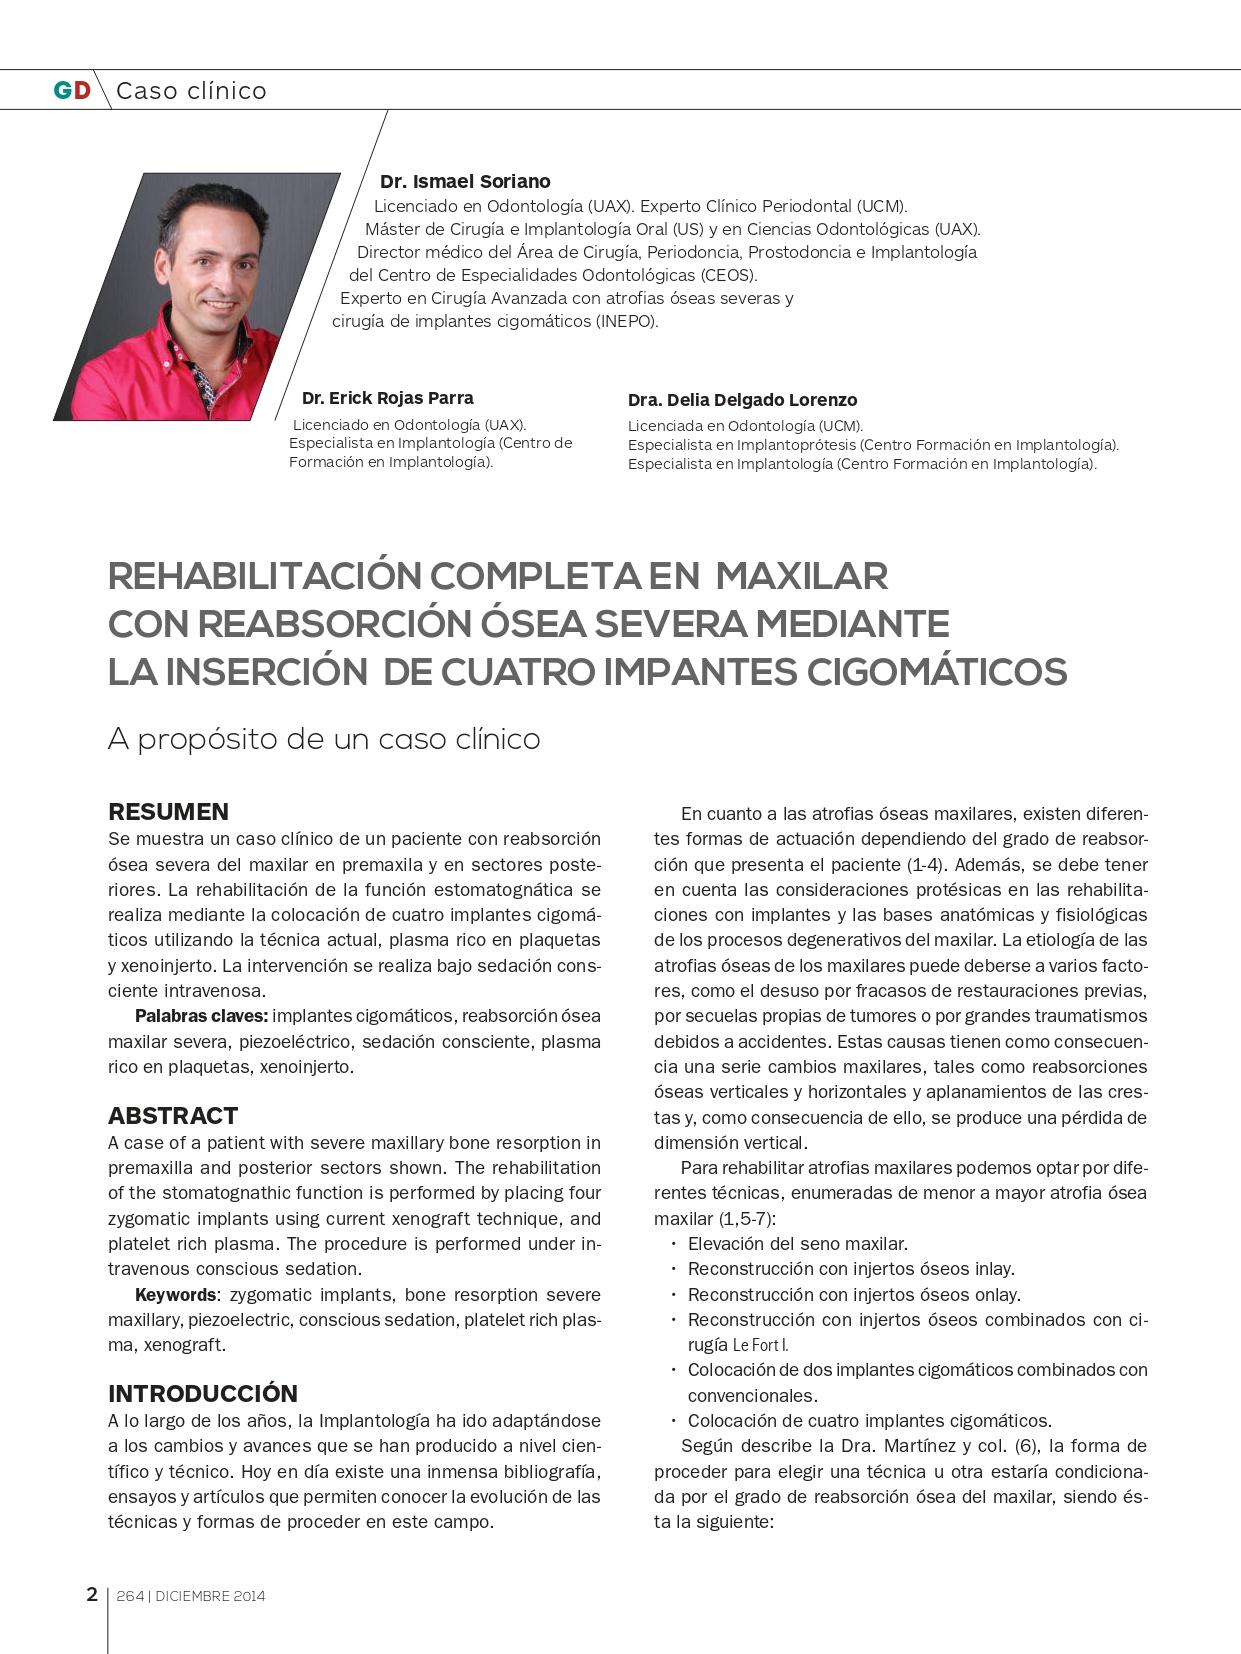 Rehabilitación-maxilar-completa-con-reabsorción-ósea-mediante-4-implantes-cigomáticos_page-0001